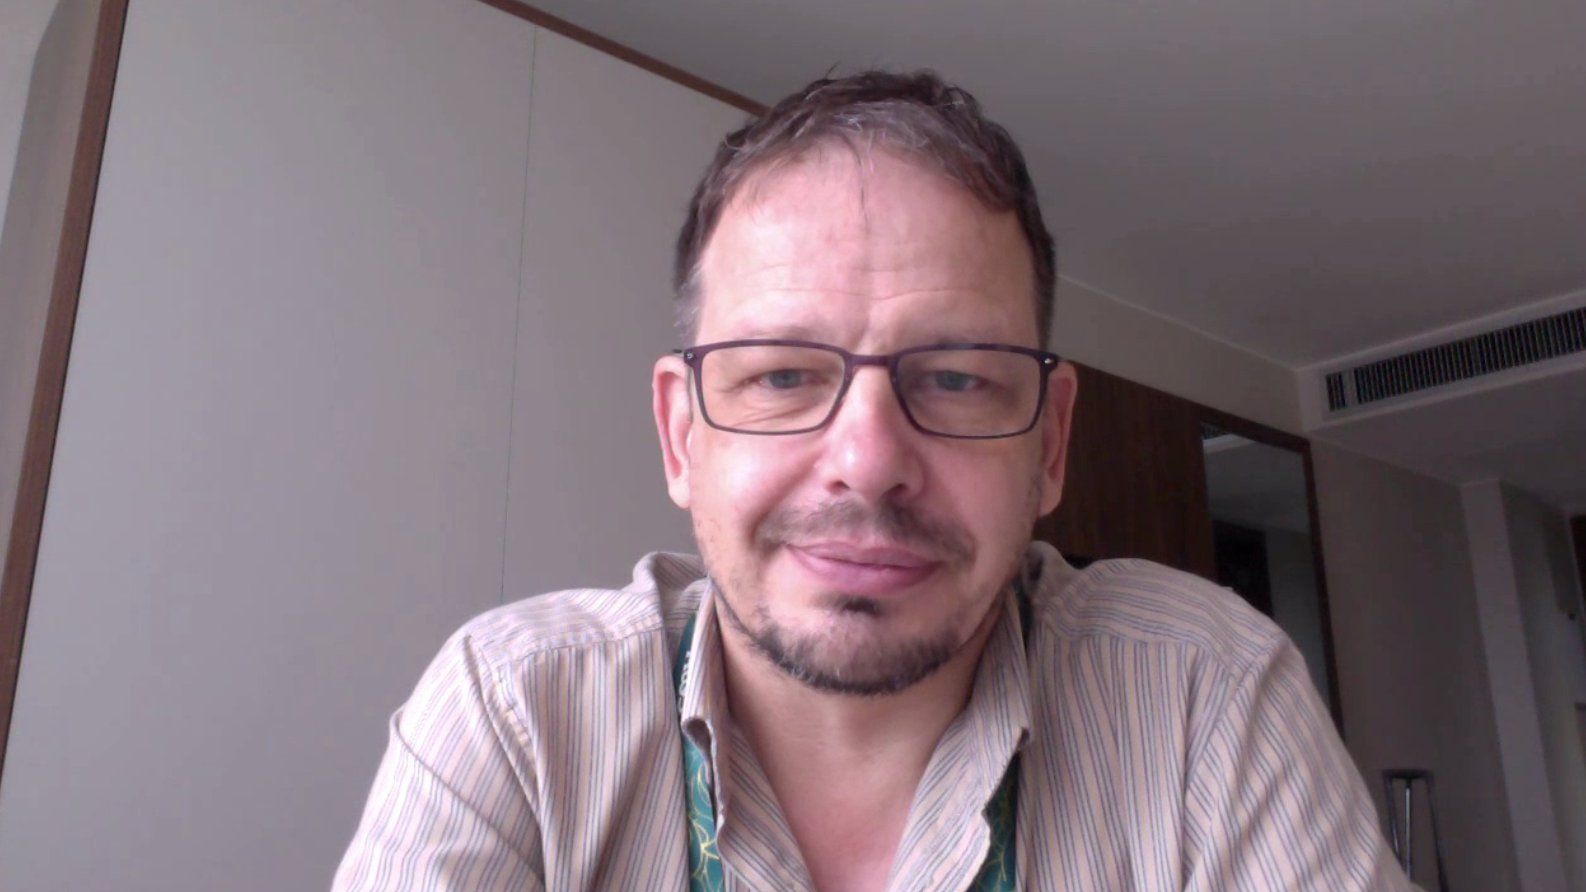 ARD Doping-Experte Hajo Seppelt über Staatsdoping in Russland